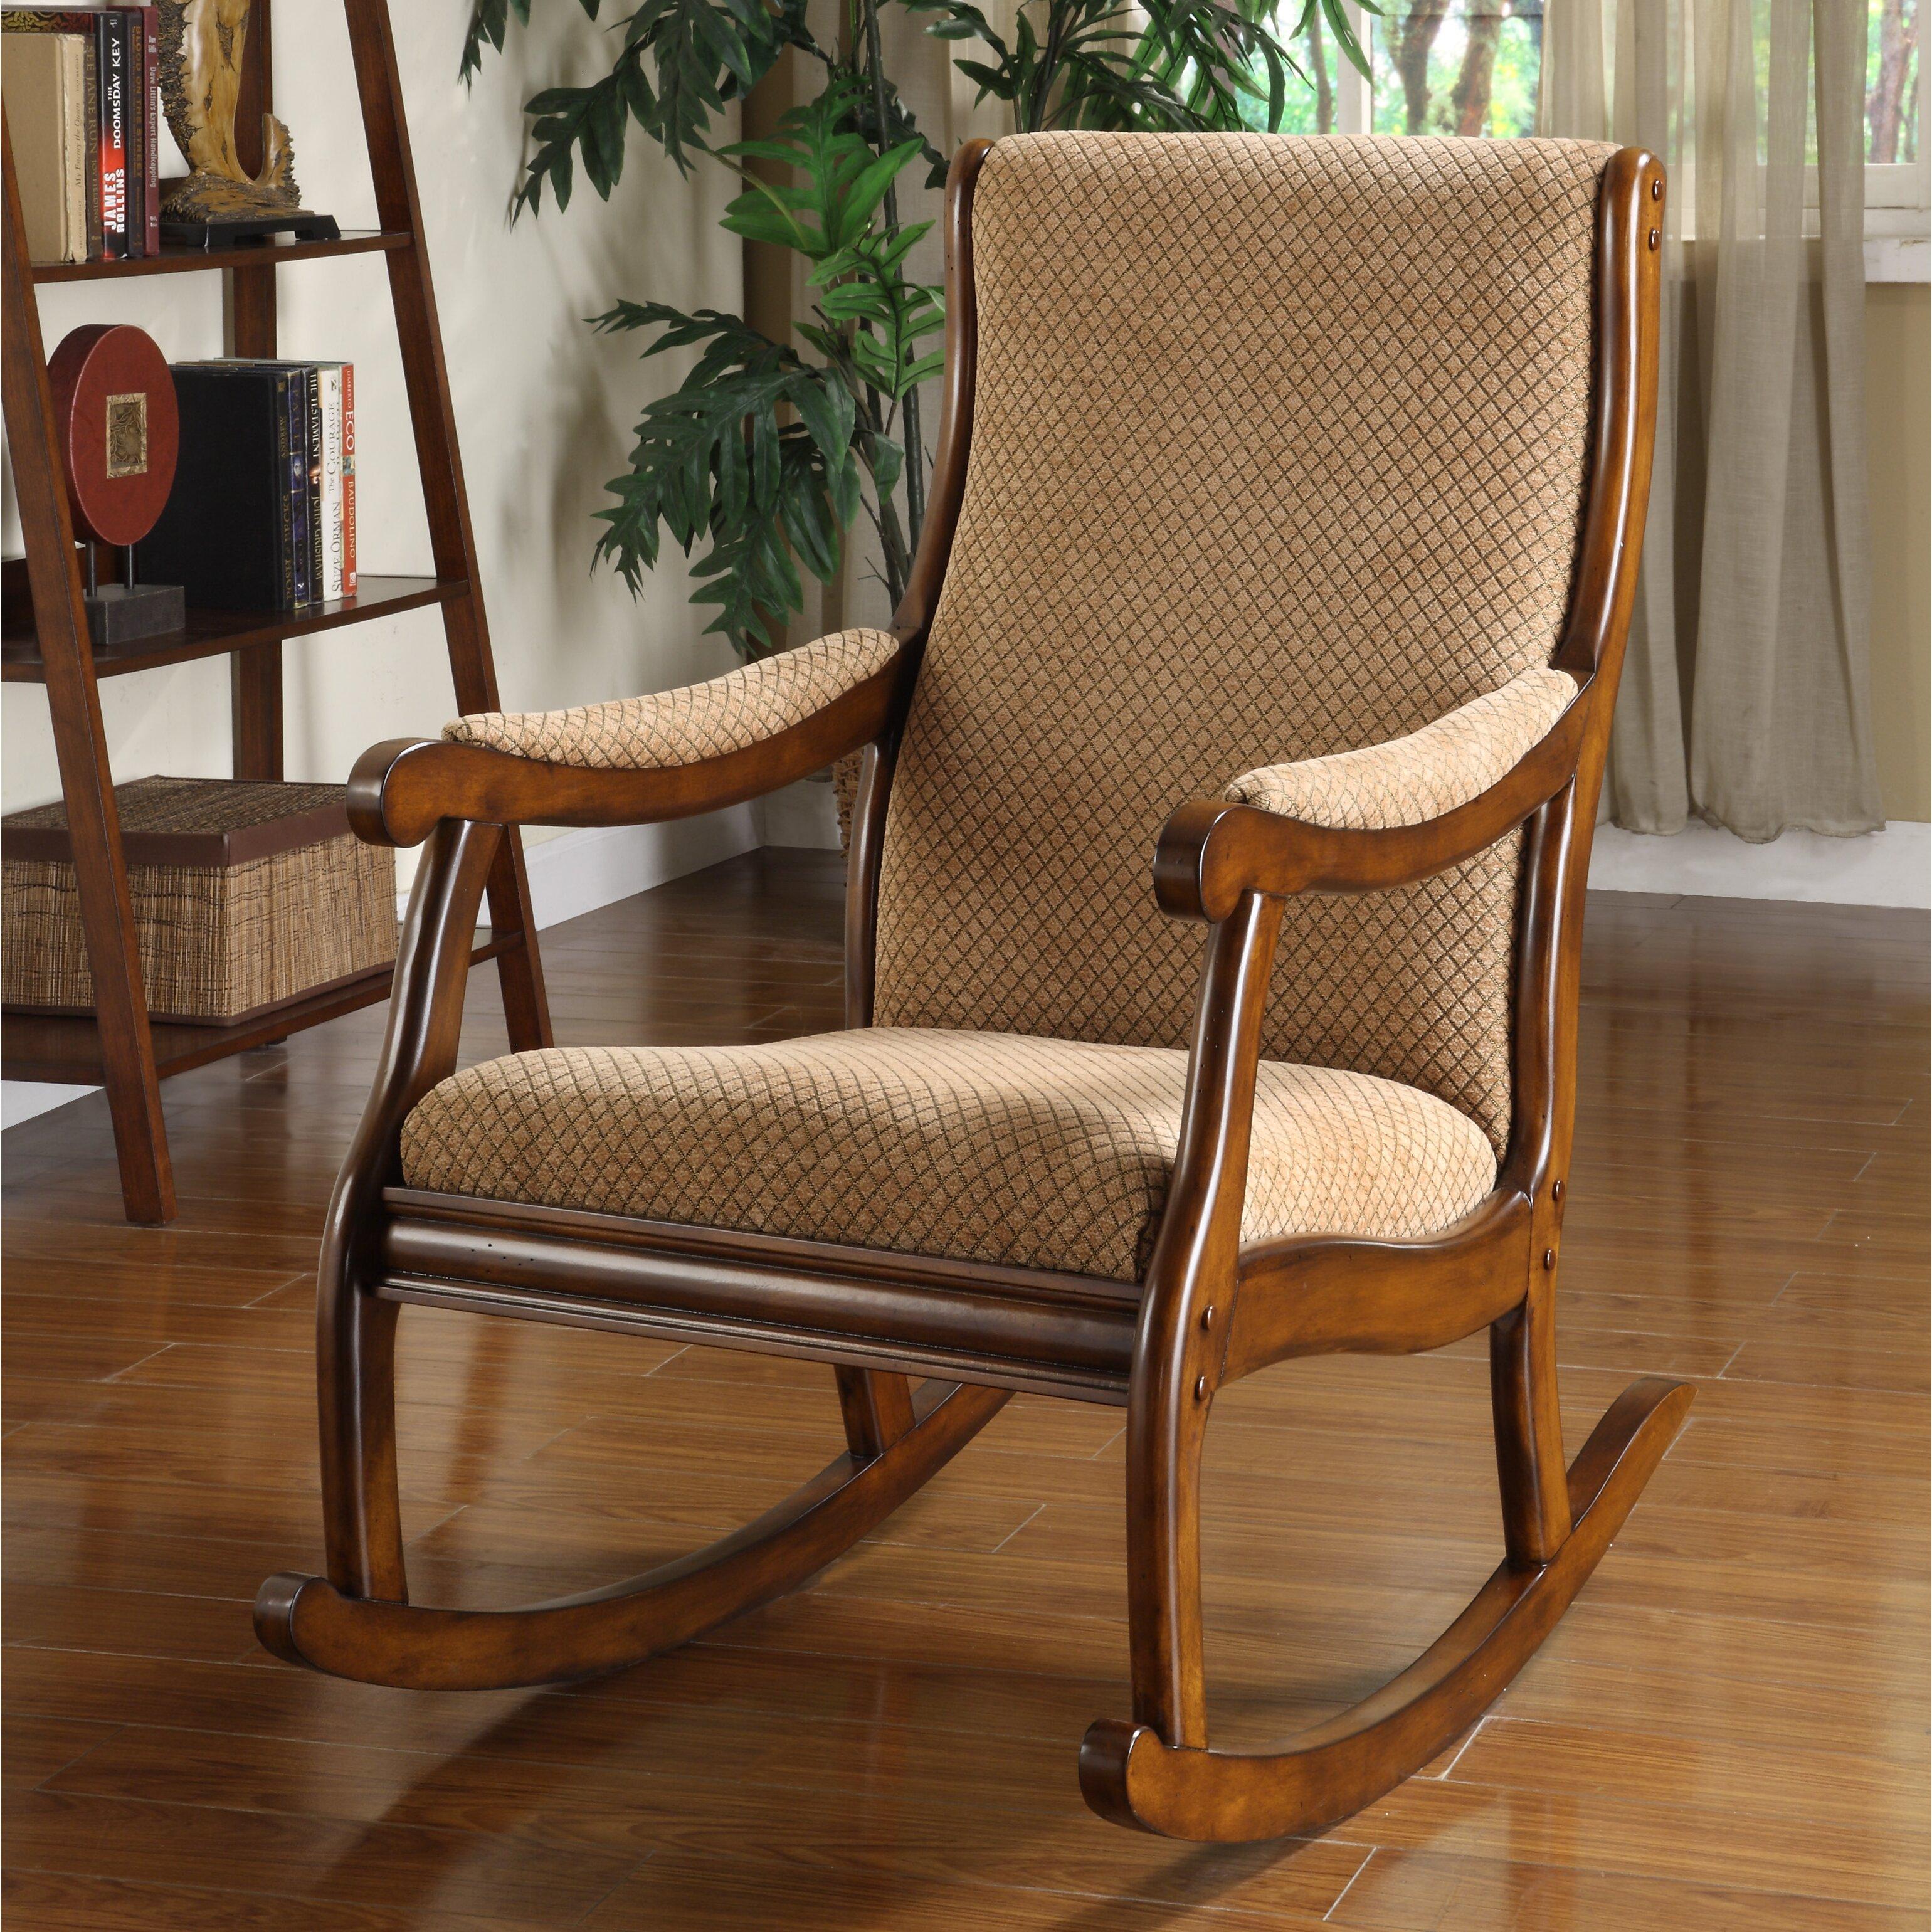 Baby cribs liverpool - Hokku Designs Liverpool Rocking Chair